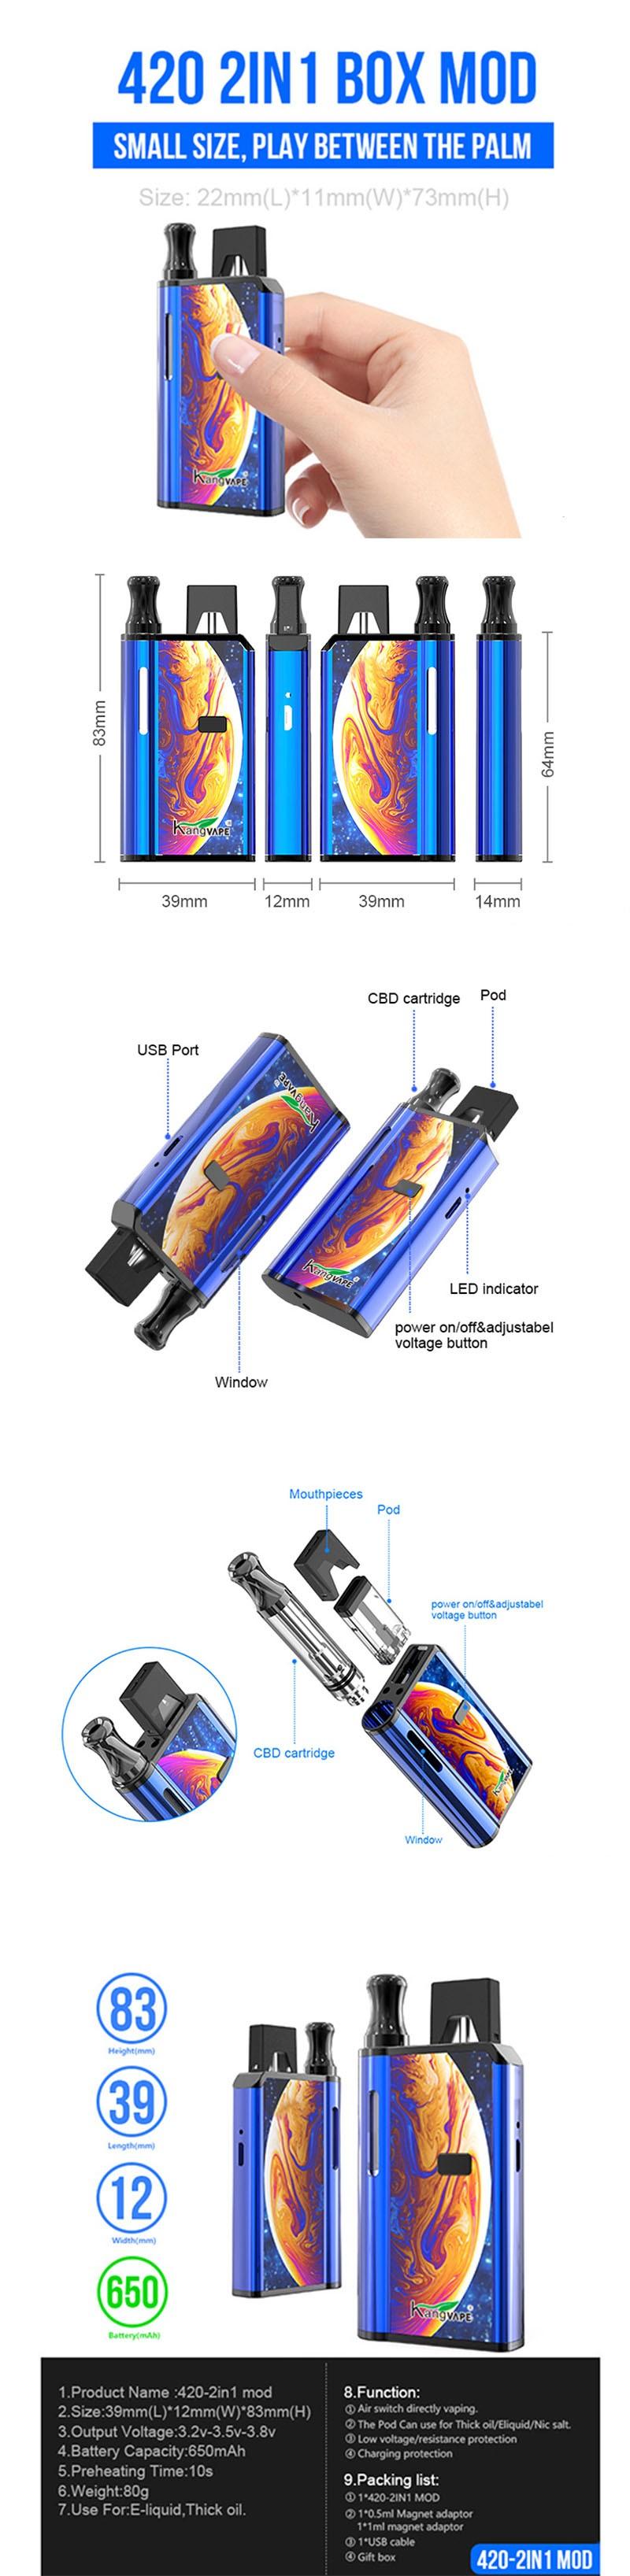 Kangvape 420-2IN1 650mAh APV VV Variable Voltage Box Mod